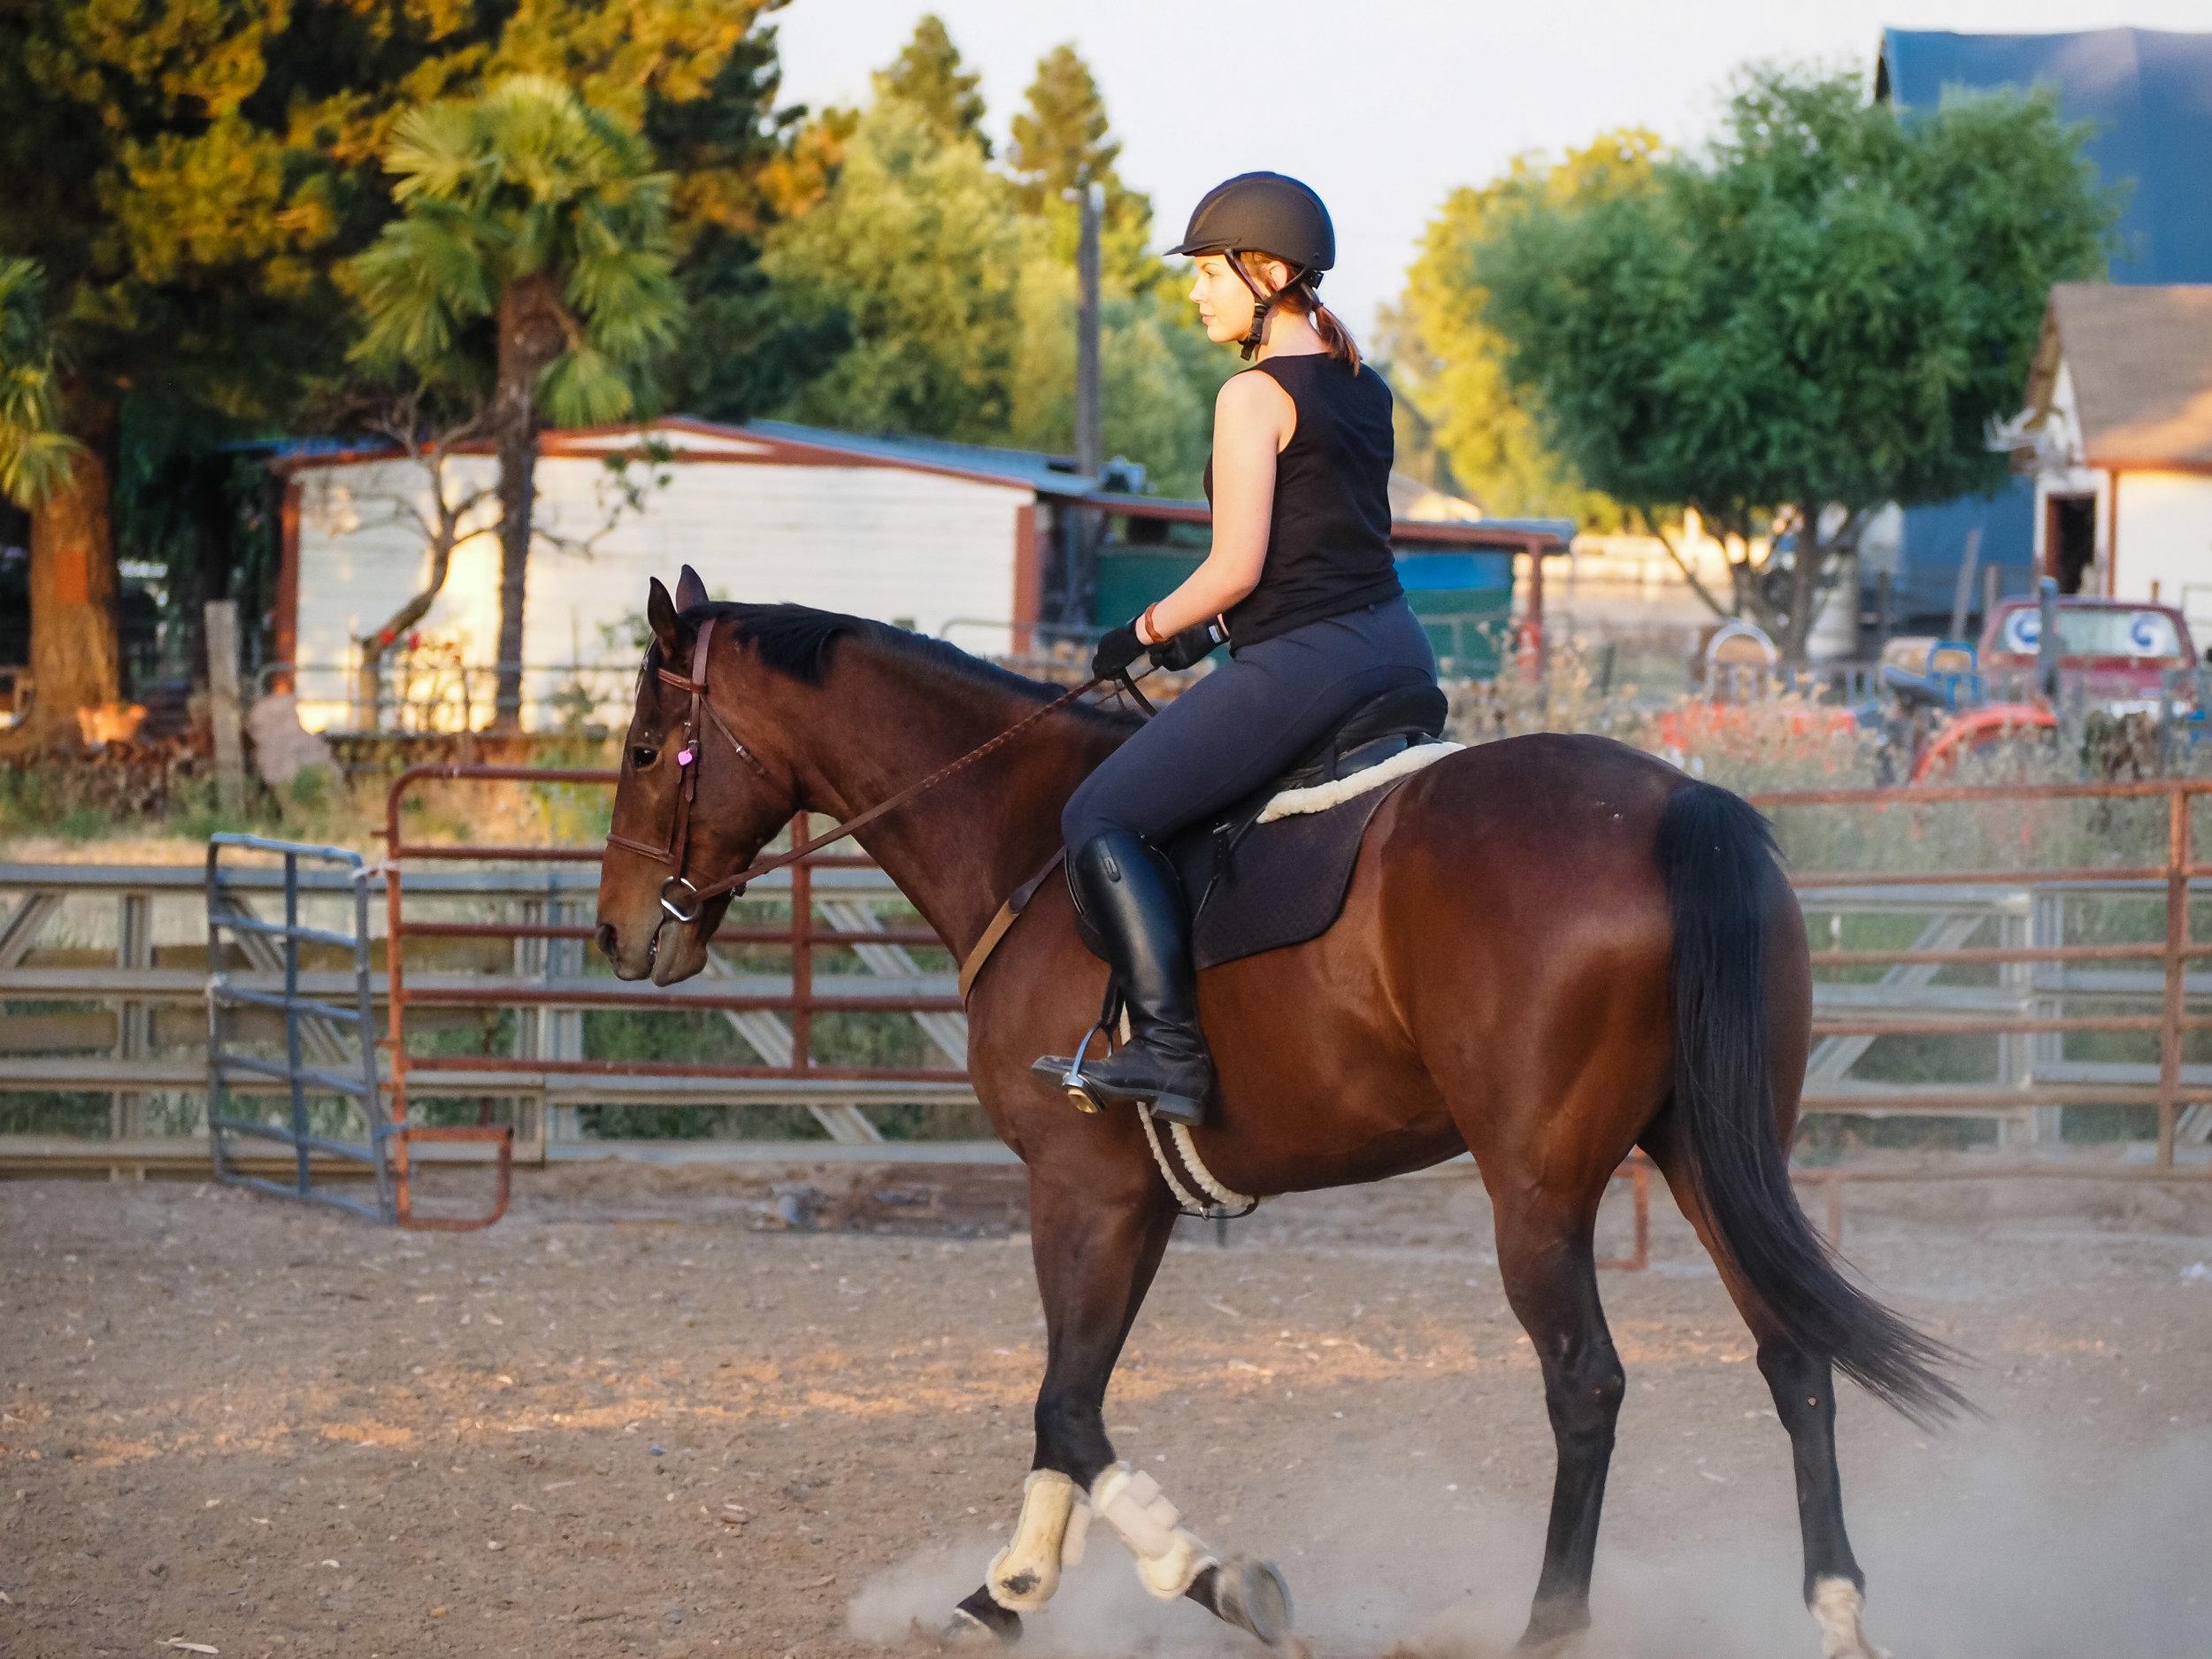 mikey-ottb-back-to-riding-4.jpg